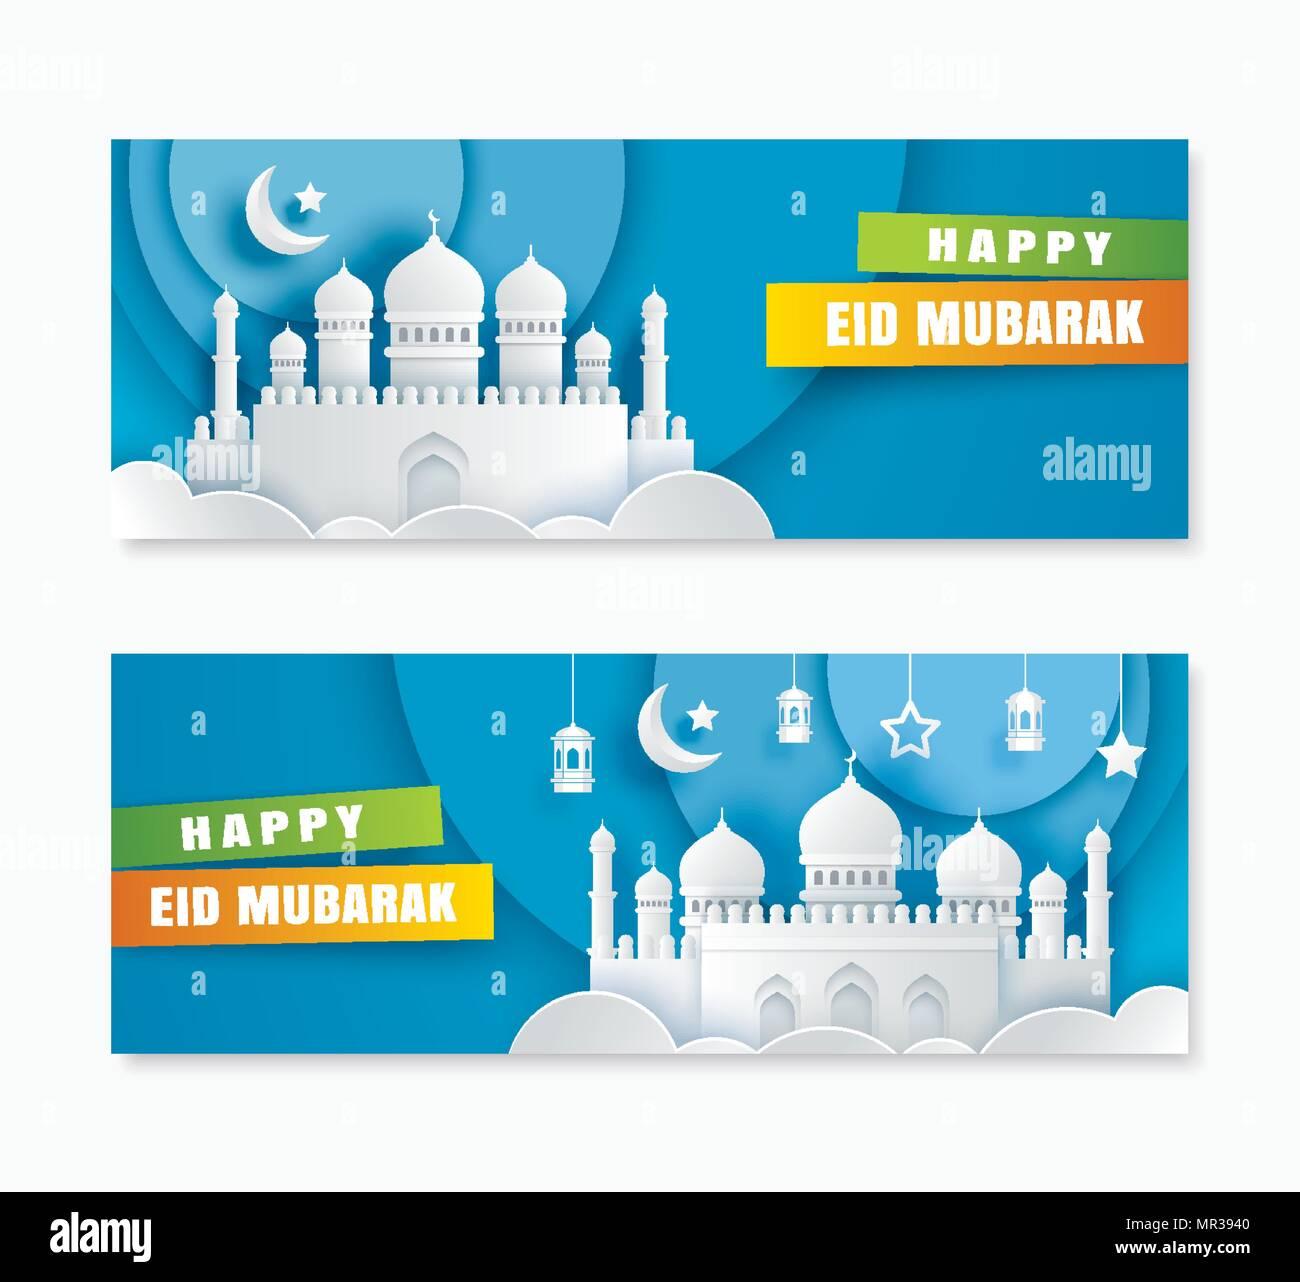 Eid mubarak greeting card stock photos eid mubarak greeting card happy eid mubarak greeting card with mosque and crescent moon paper art background ramadan kareem m4hsunfo